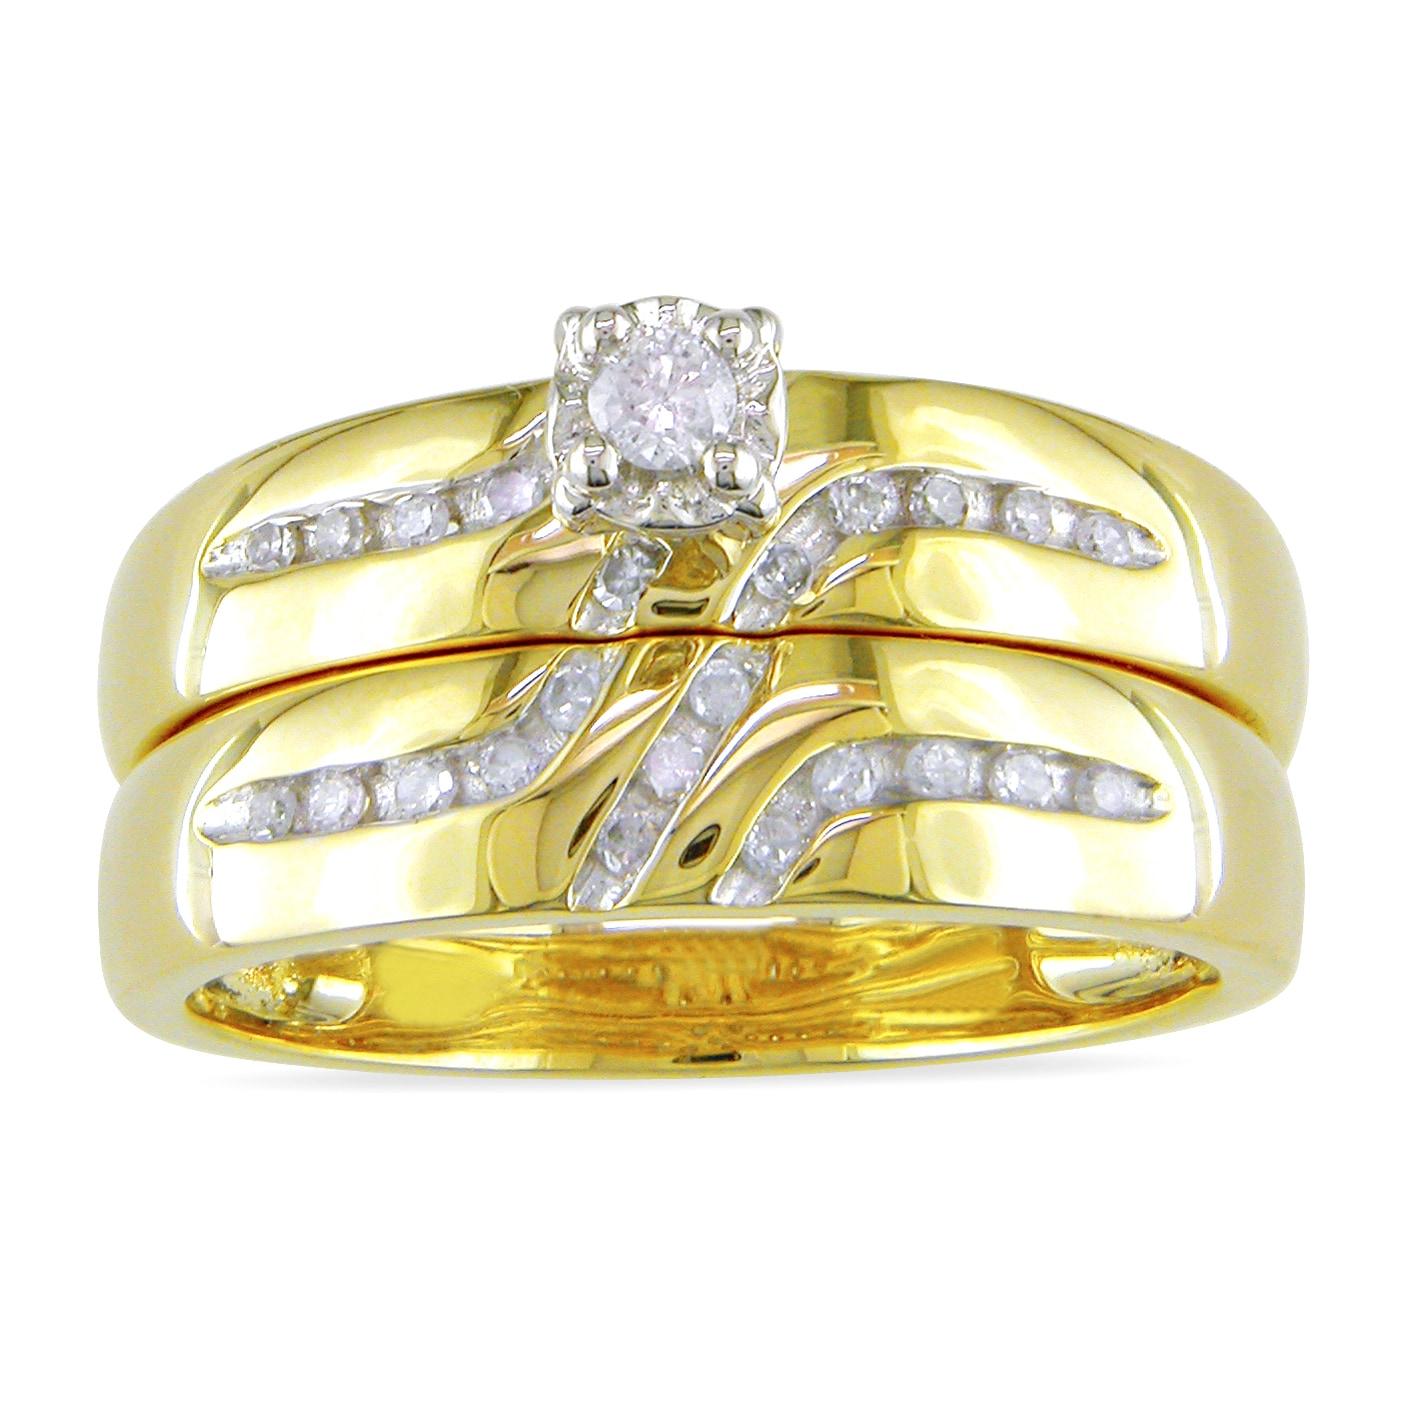 Miadora 10k Yellow Gold 1/6ct TDW Diamond Bridal Ring Set (H-I, I2-I3)